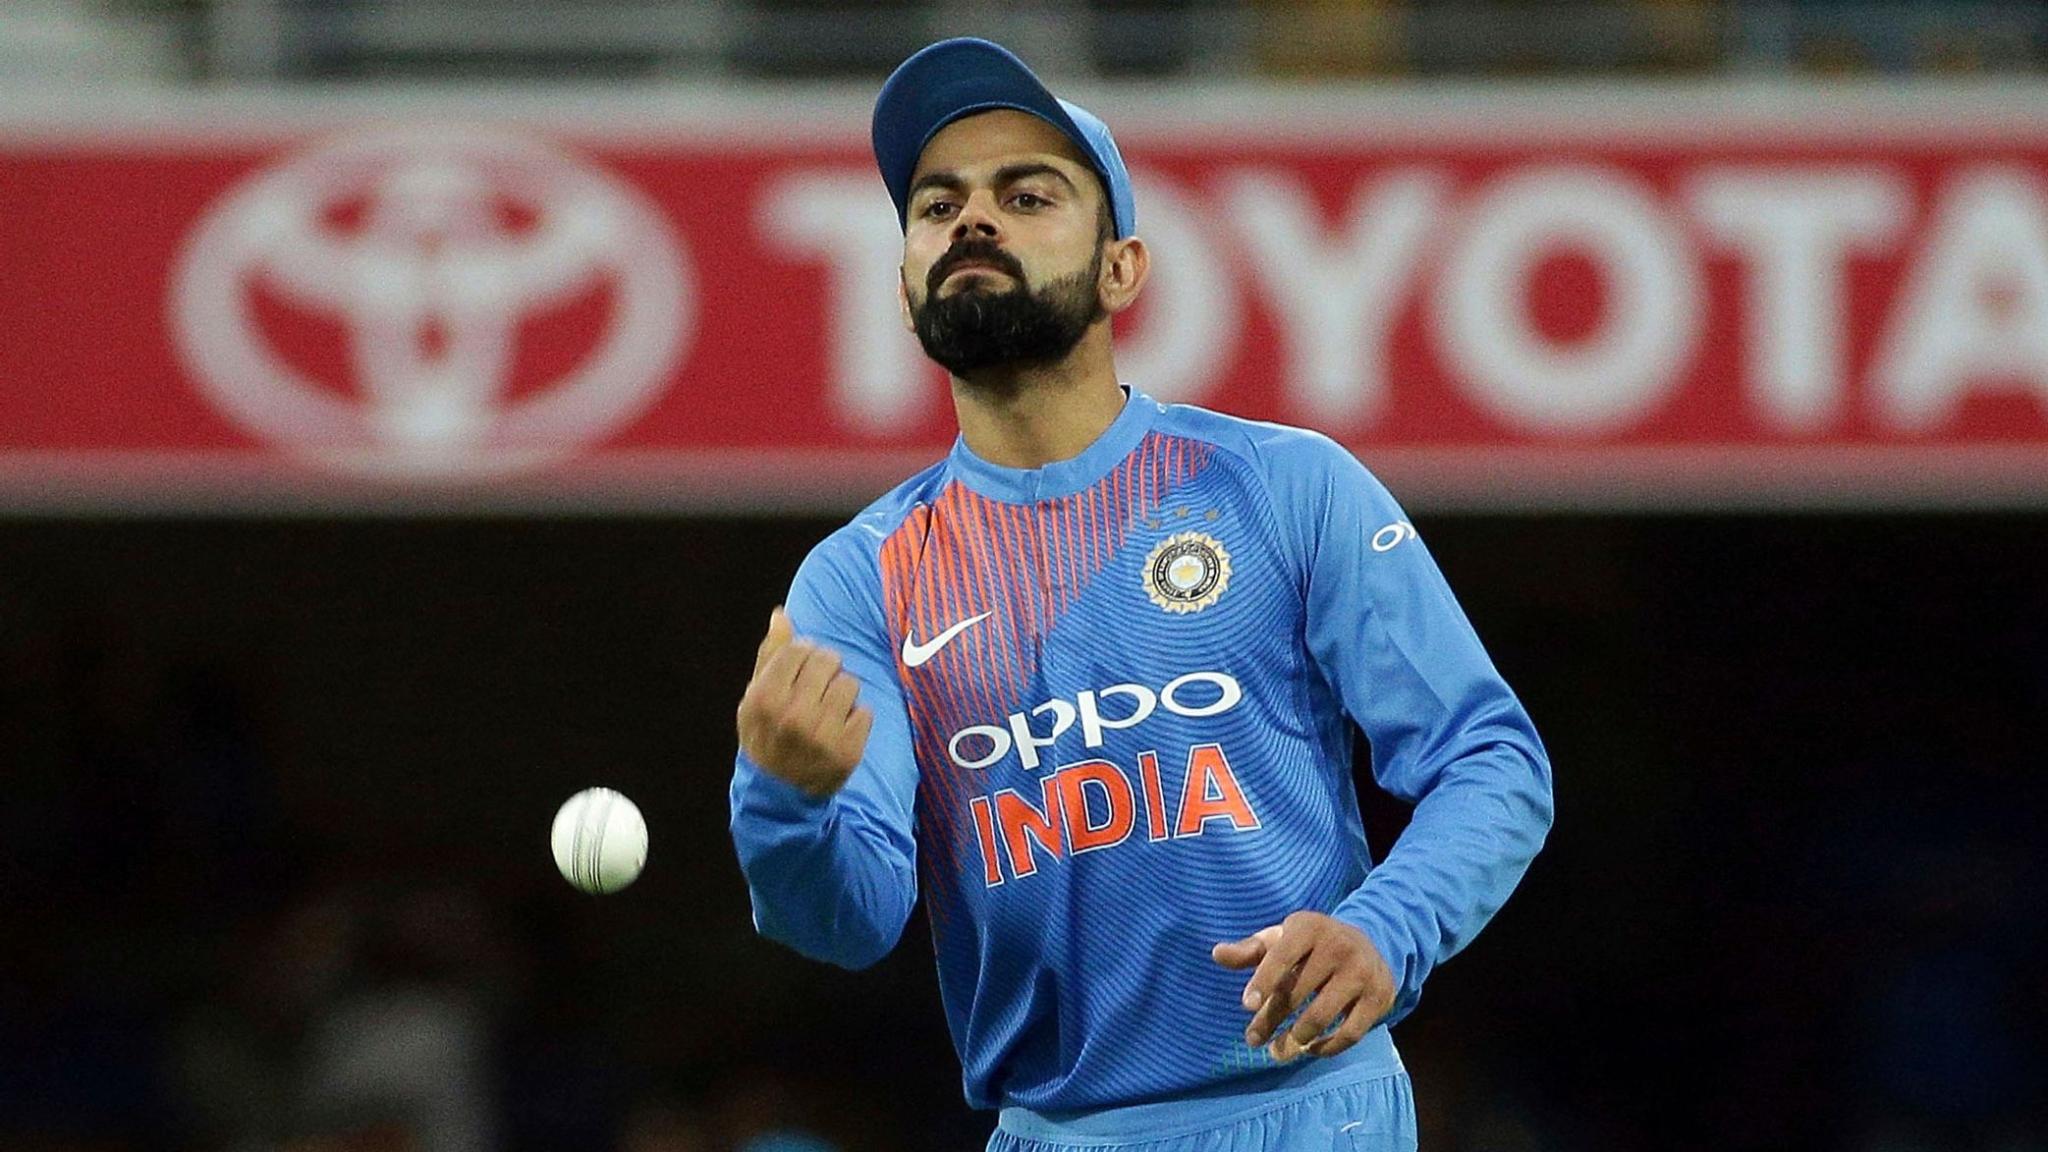 India vs SA 3rd T20I: Virat Kohli Wins Toss, Elects to Bat First